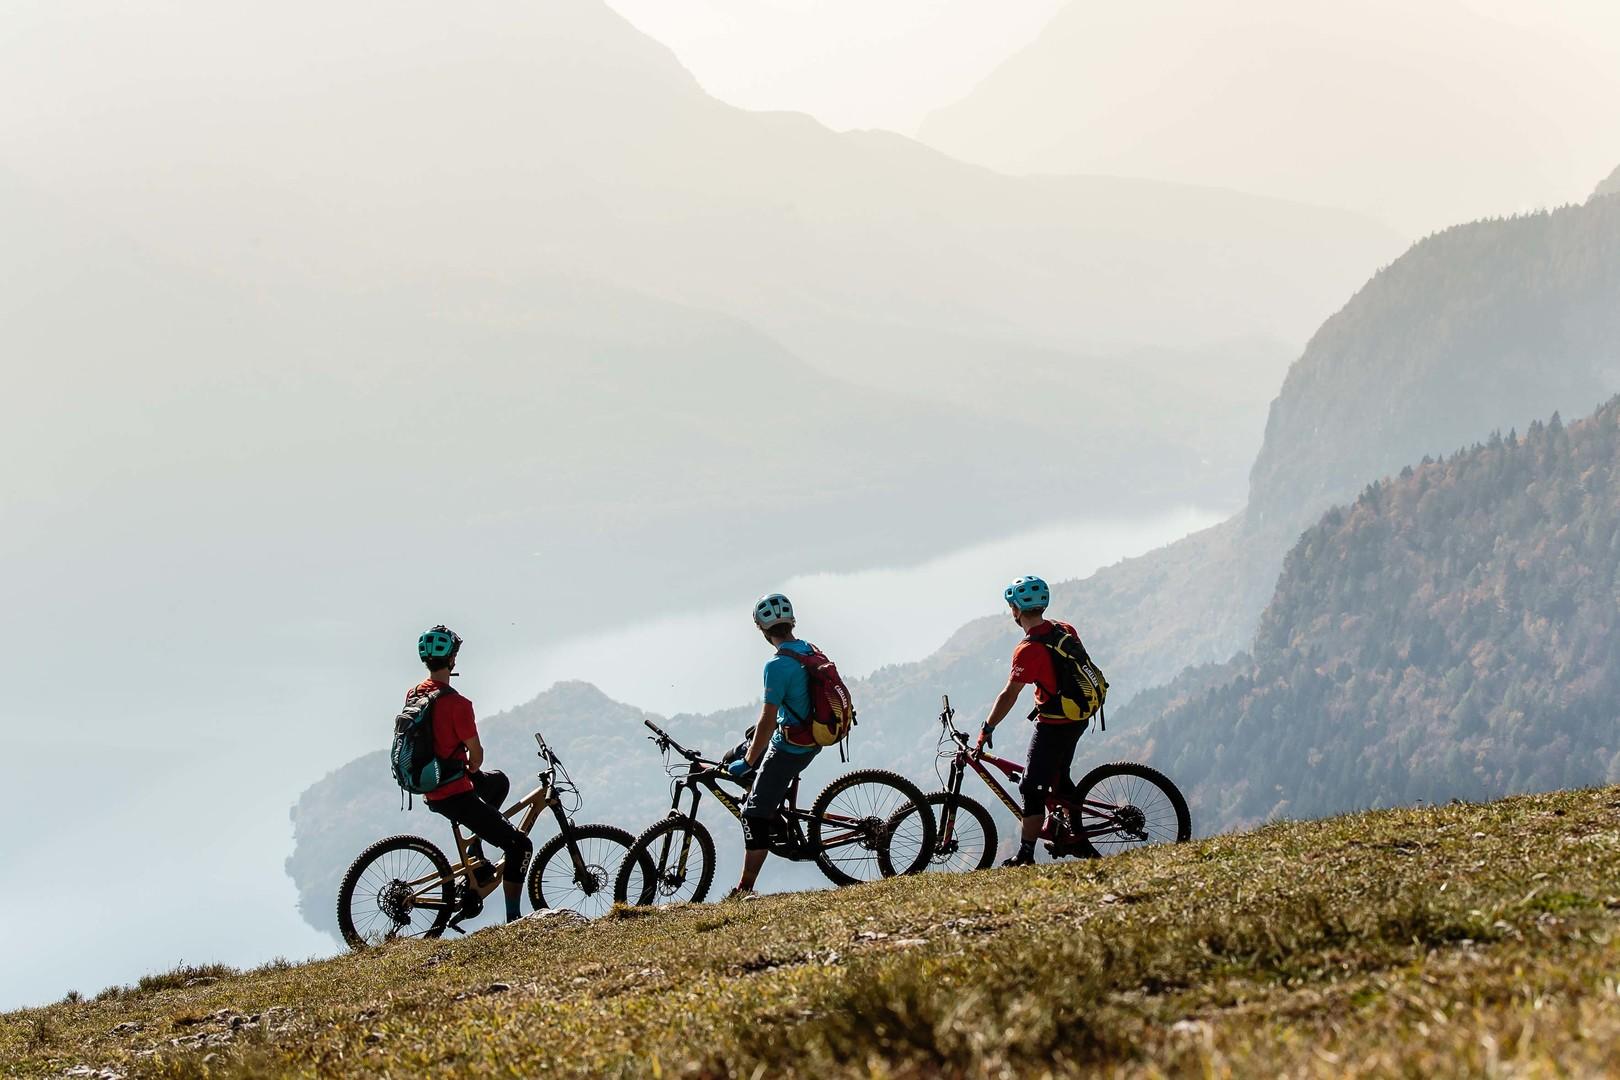 Dolomiti Paganella Bike - Molveno Zone